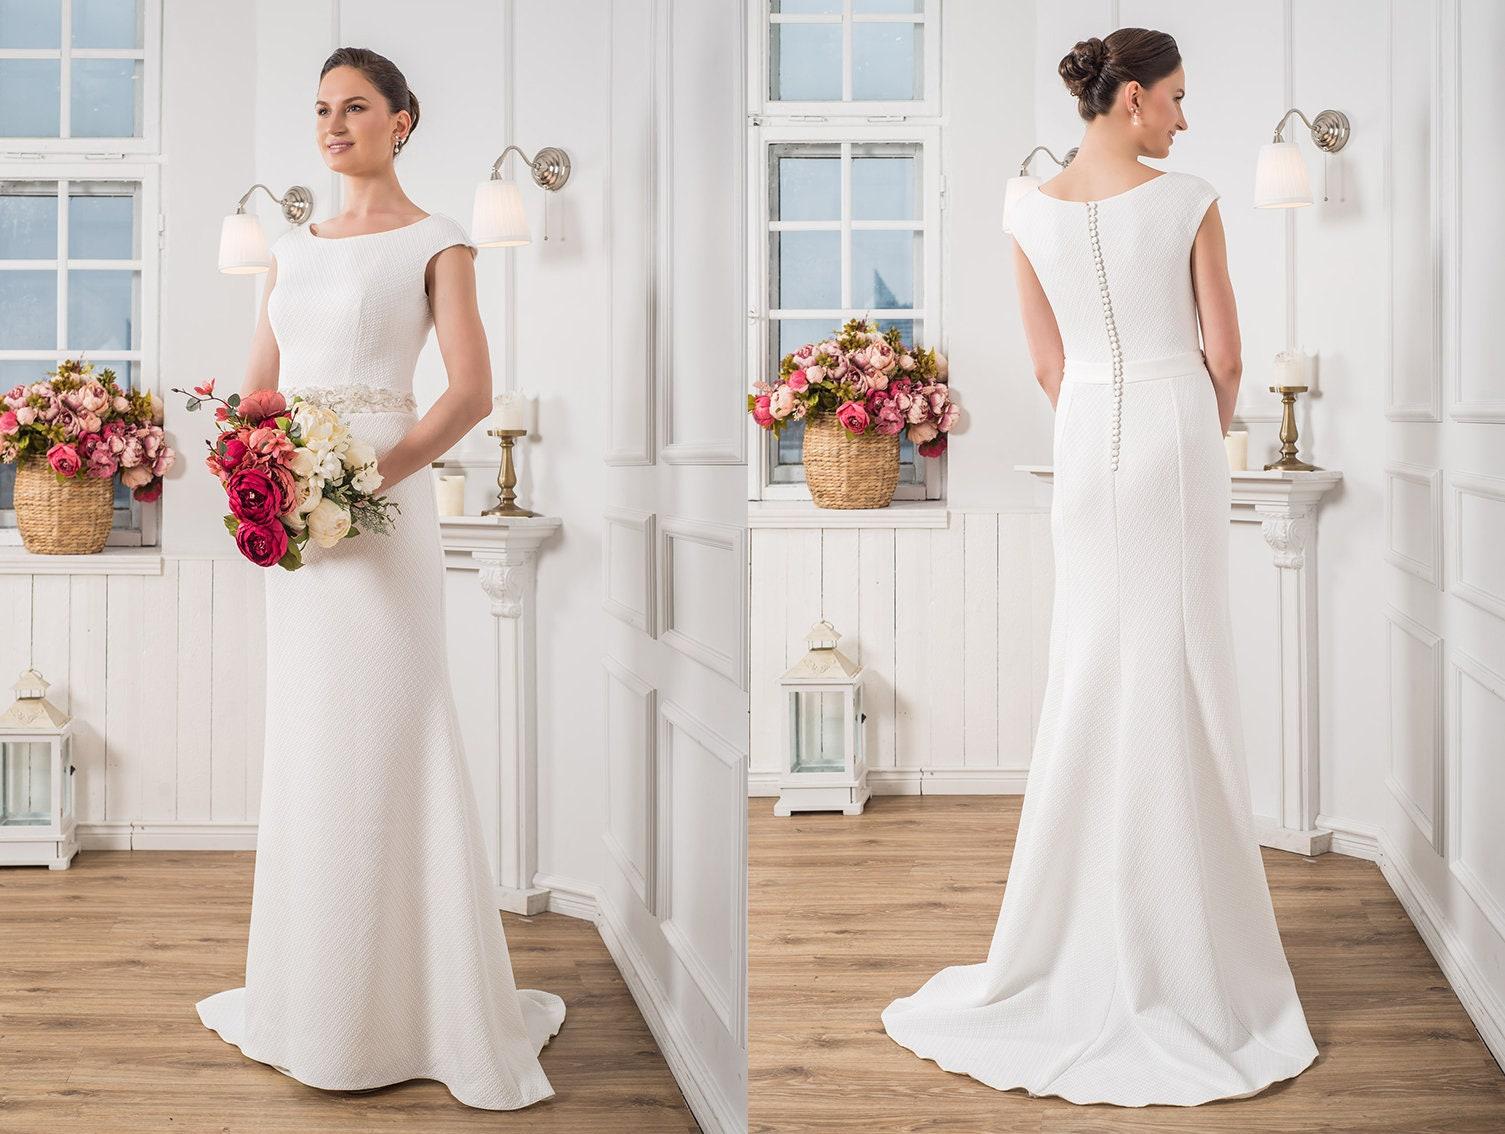 Eirene Modest Wedding Dress Simple Wedding Dress Bridal: Elegant Wedding Dress Modest Wedding Gown Minimalist